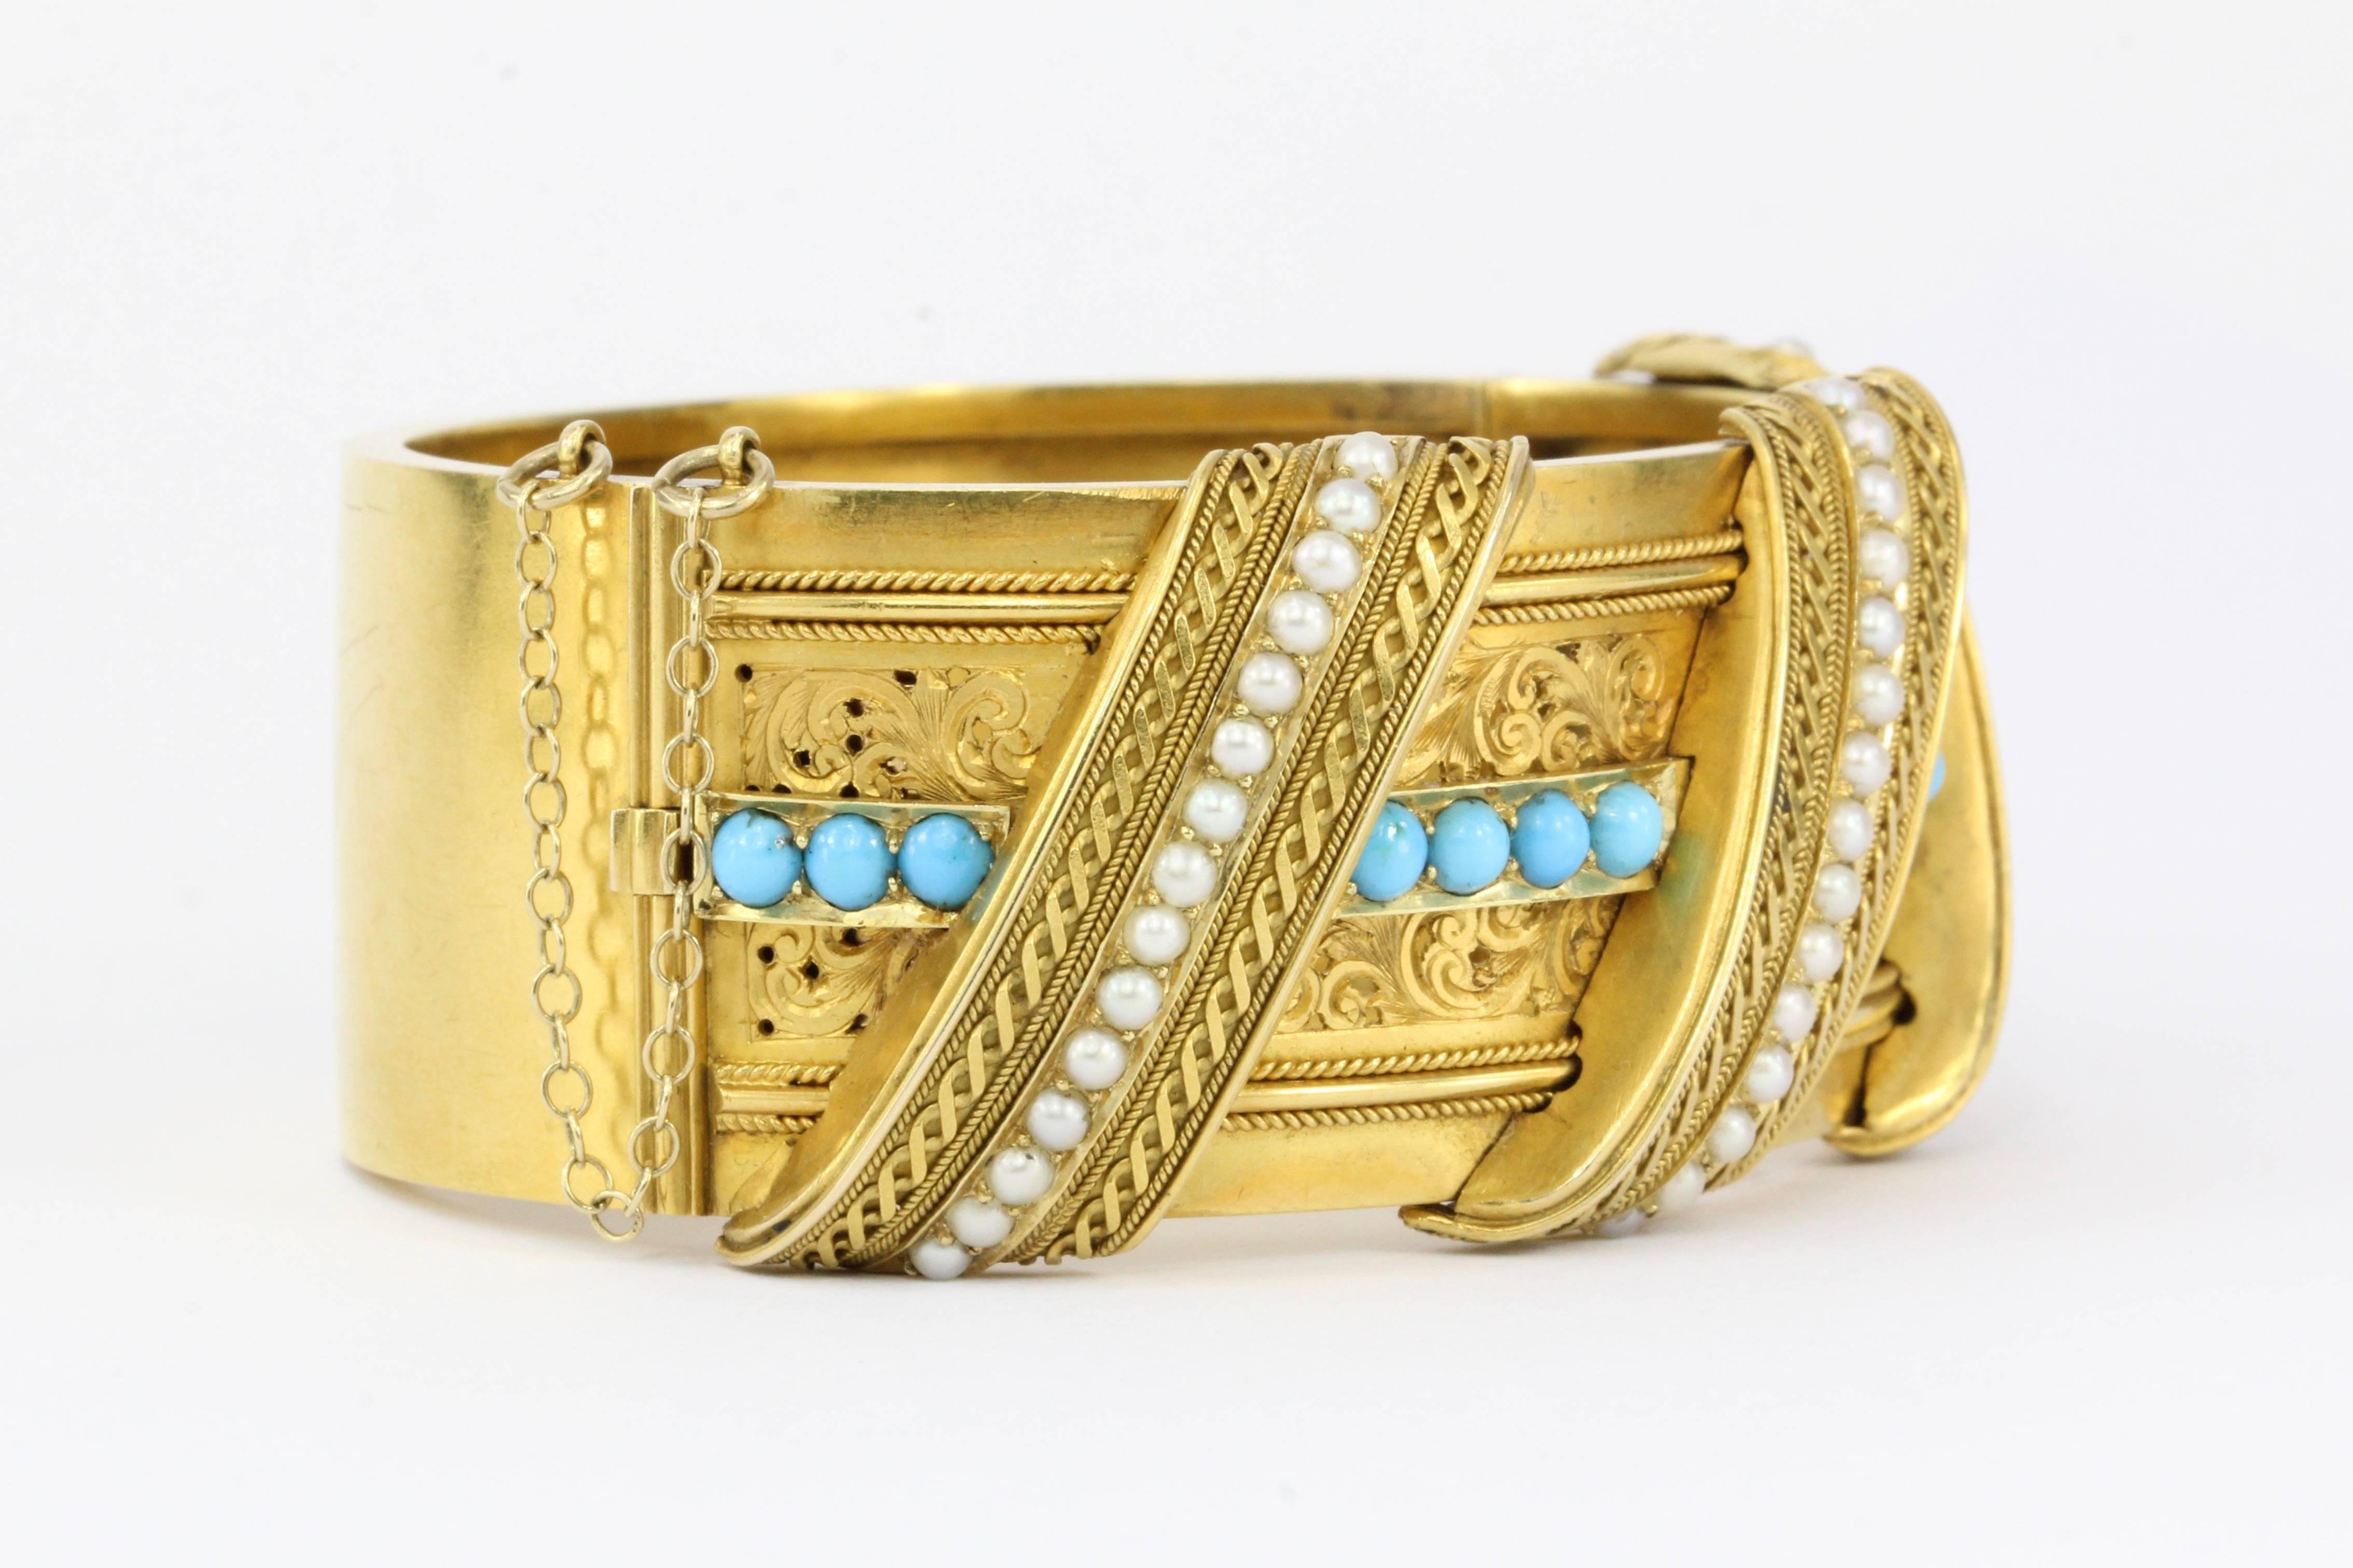 Art Deco 14k Gold Pearl Blue Enamel Bracelet Antique 20 Pearls Approx 6.25 Mm Attractive Designs; Victorian